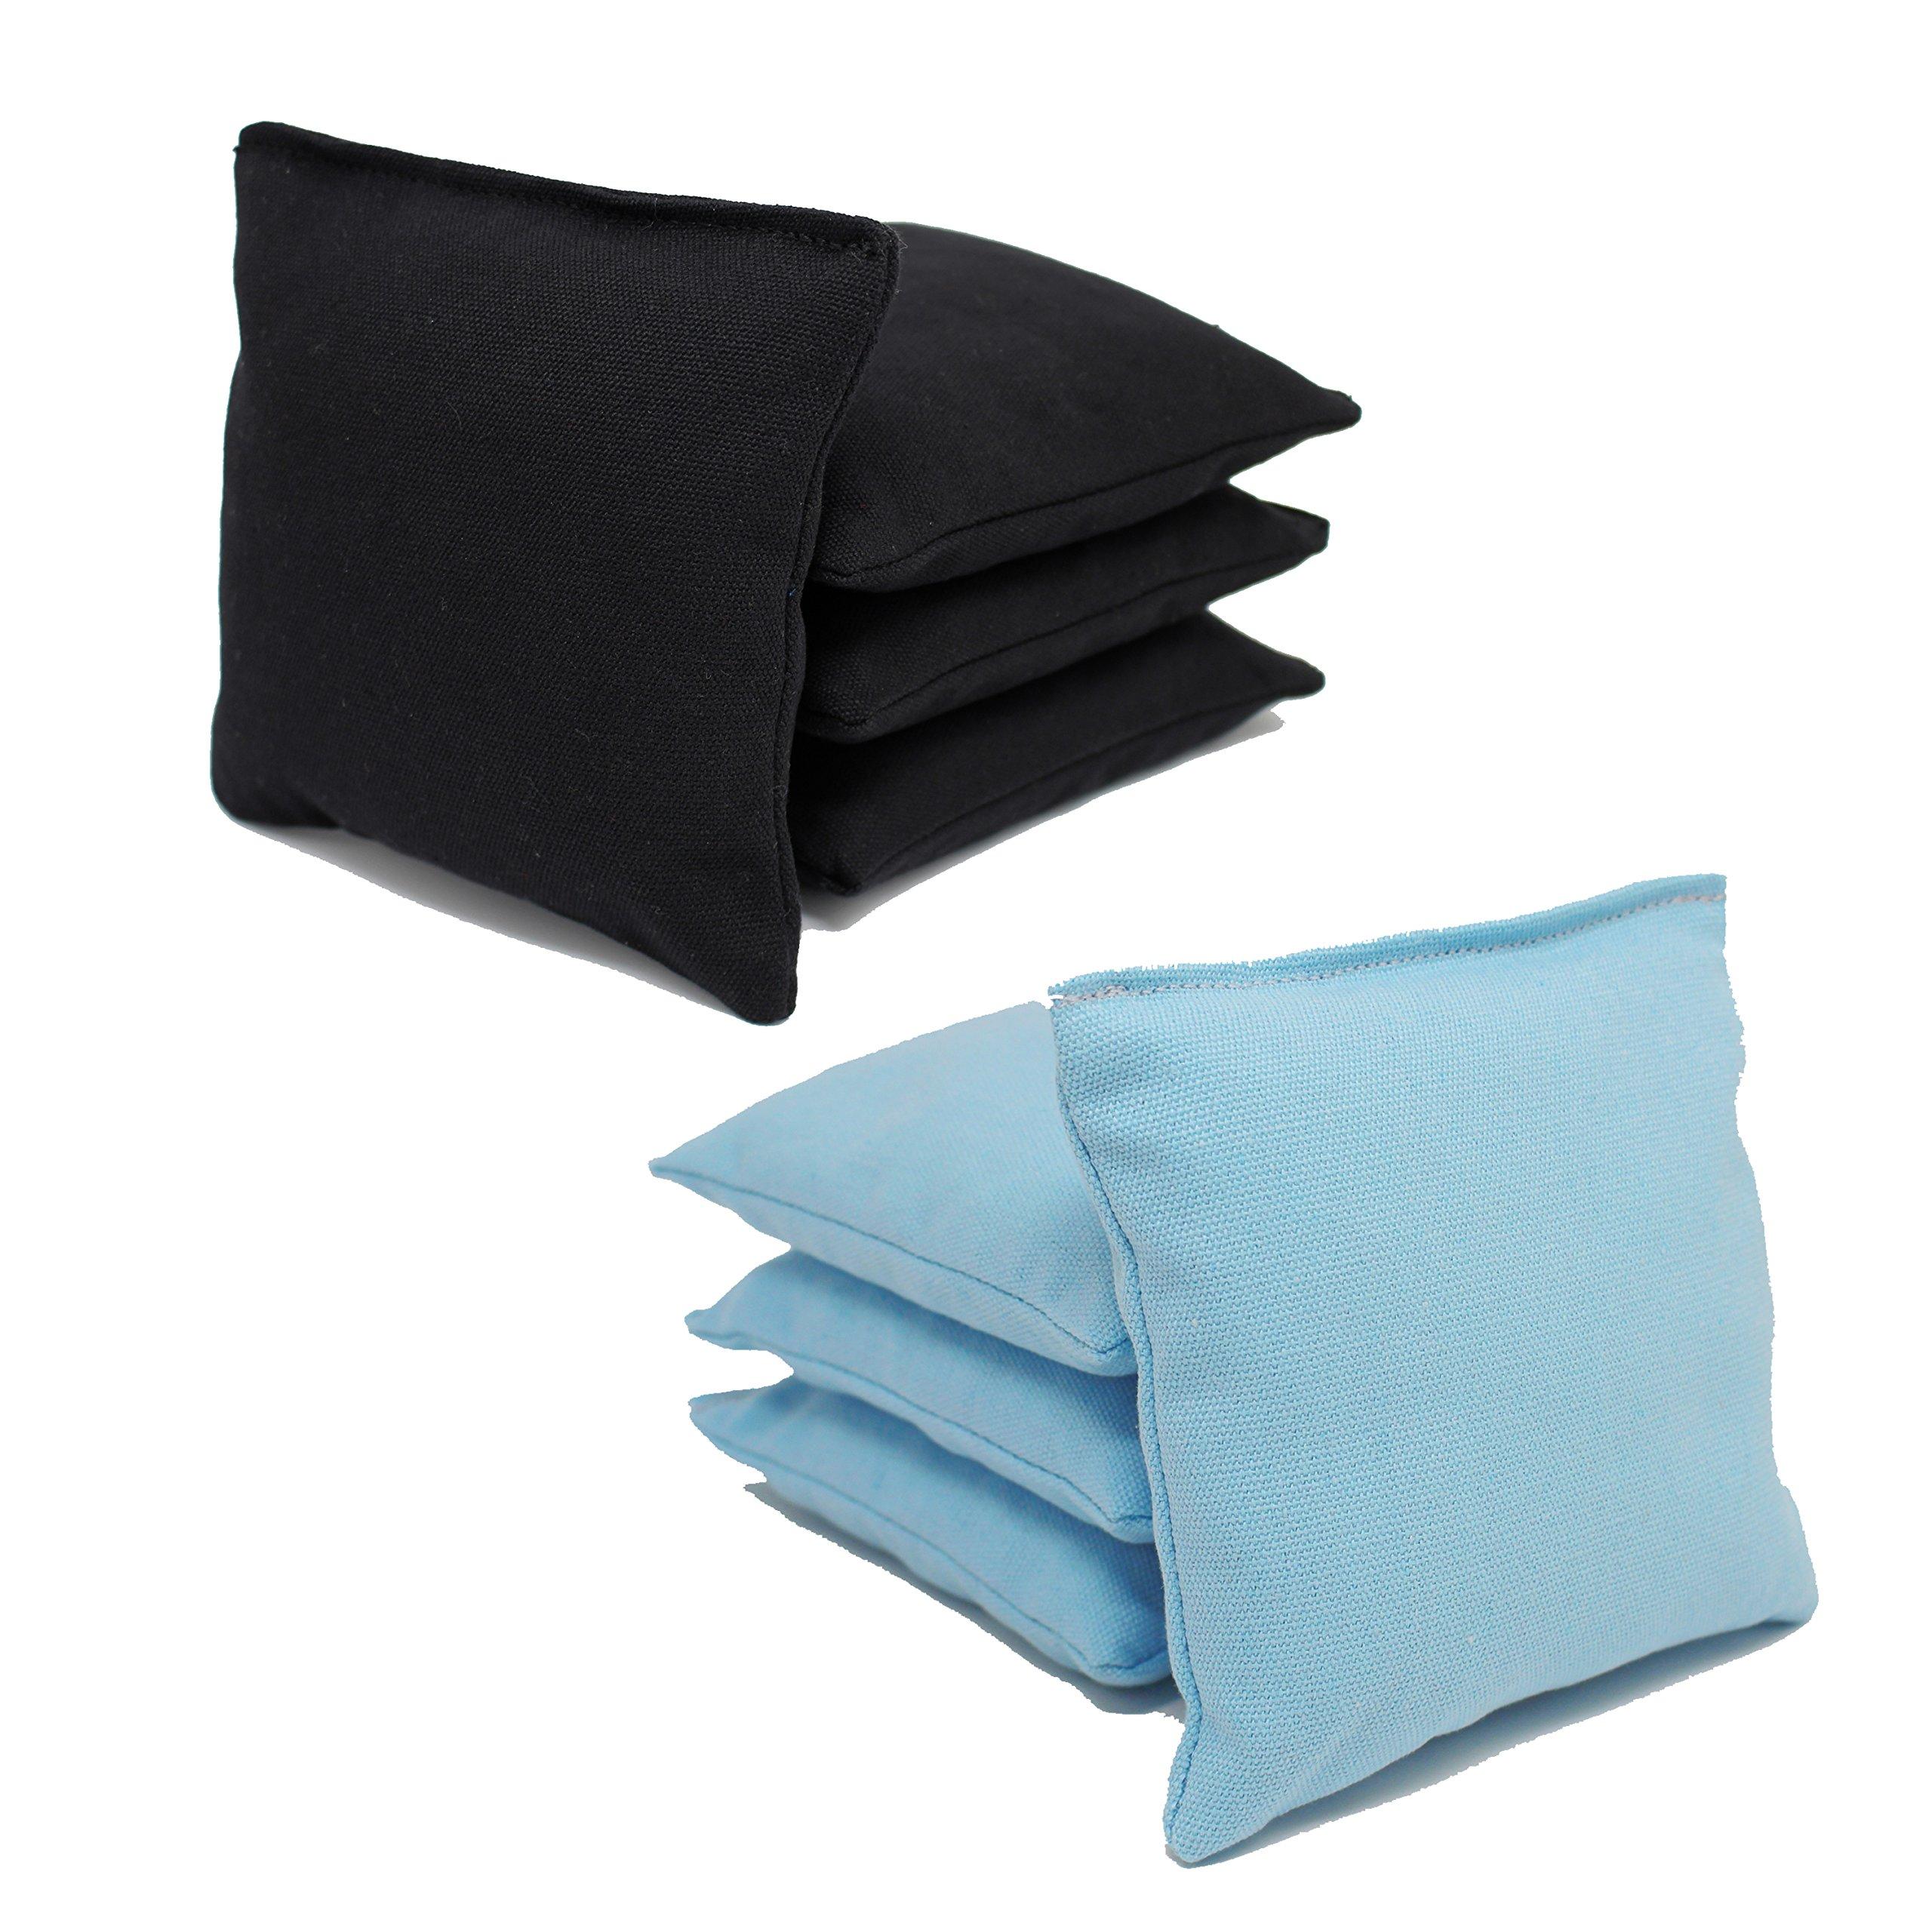 Cornhole Bags Set - (4 Light Blue, 4 Black) By Free Donkey Sports